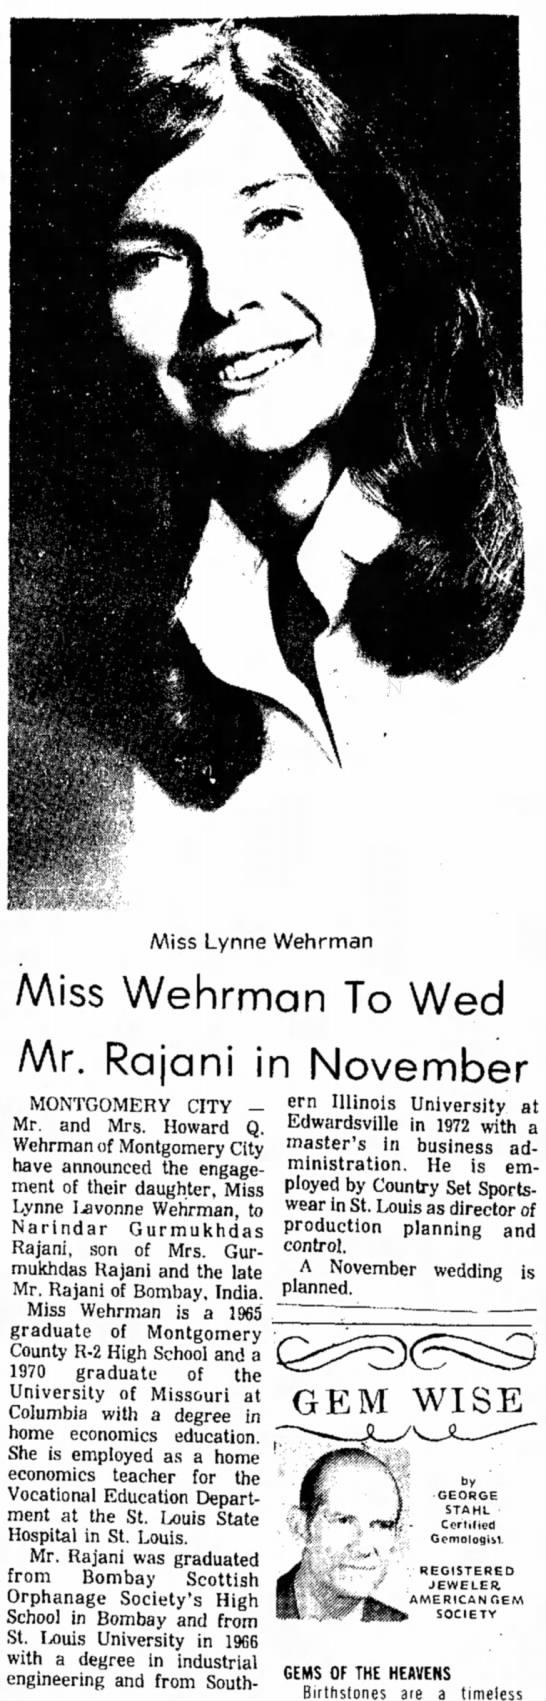 Miss Wehrman To Wed Mr. Rajani in November -